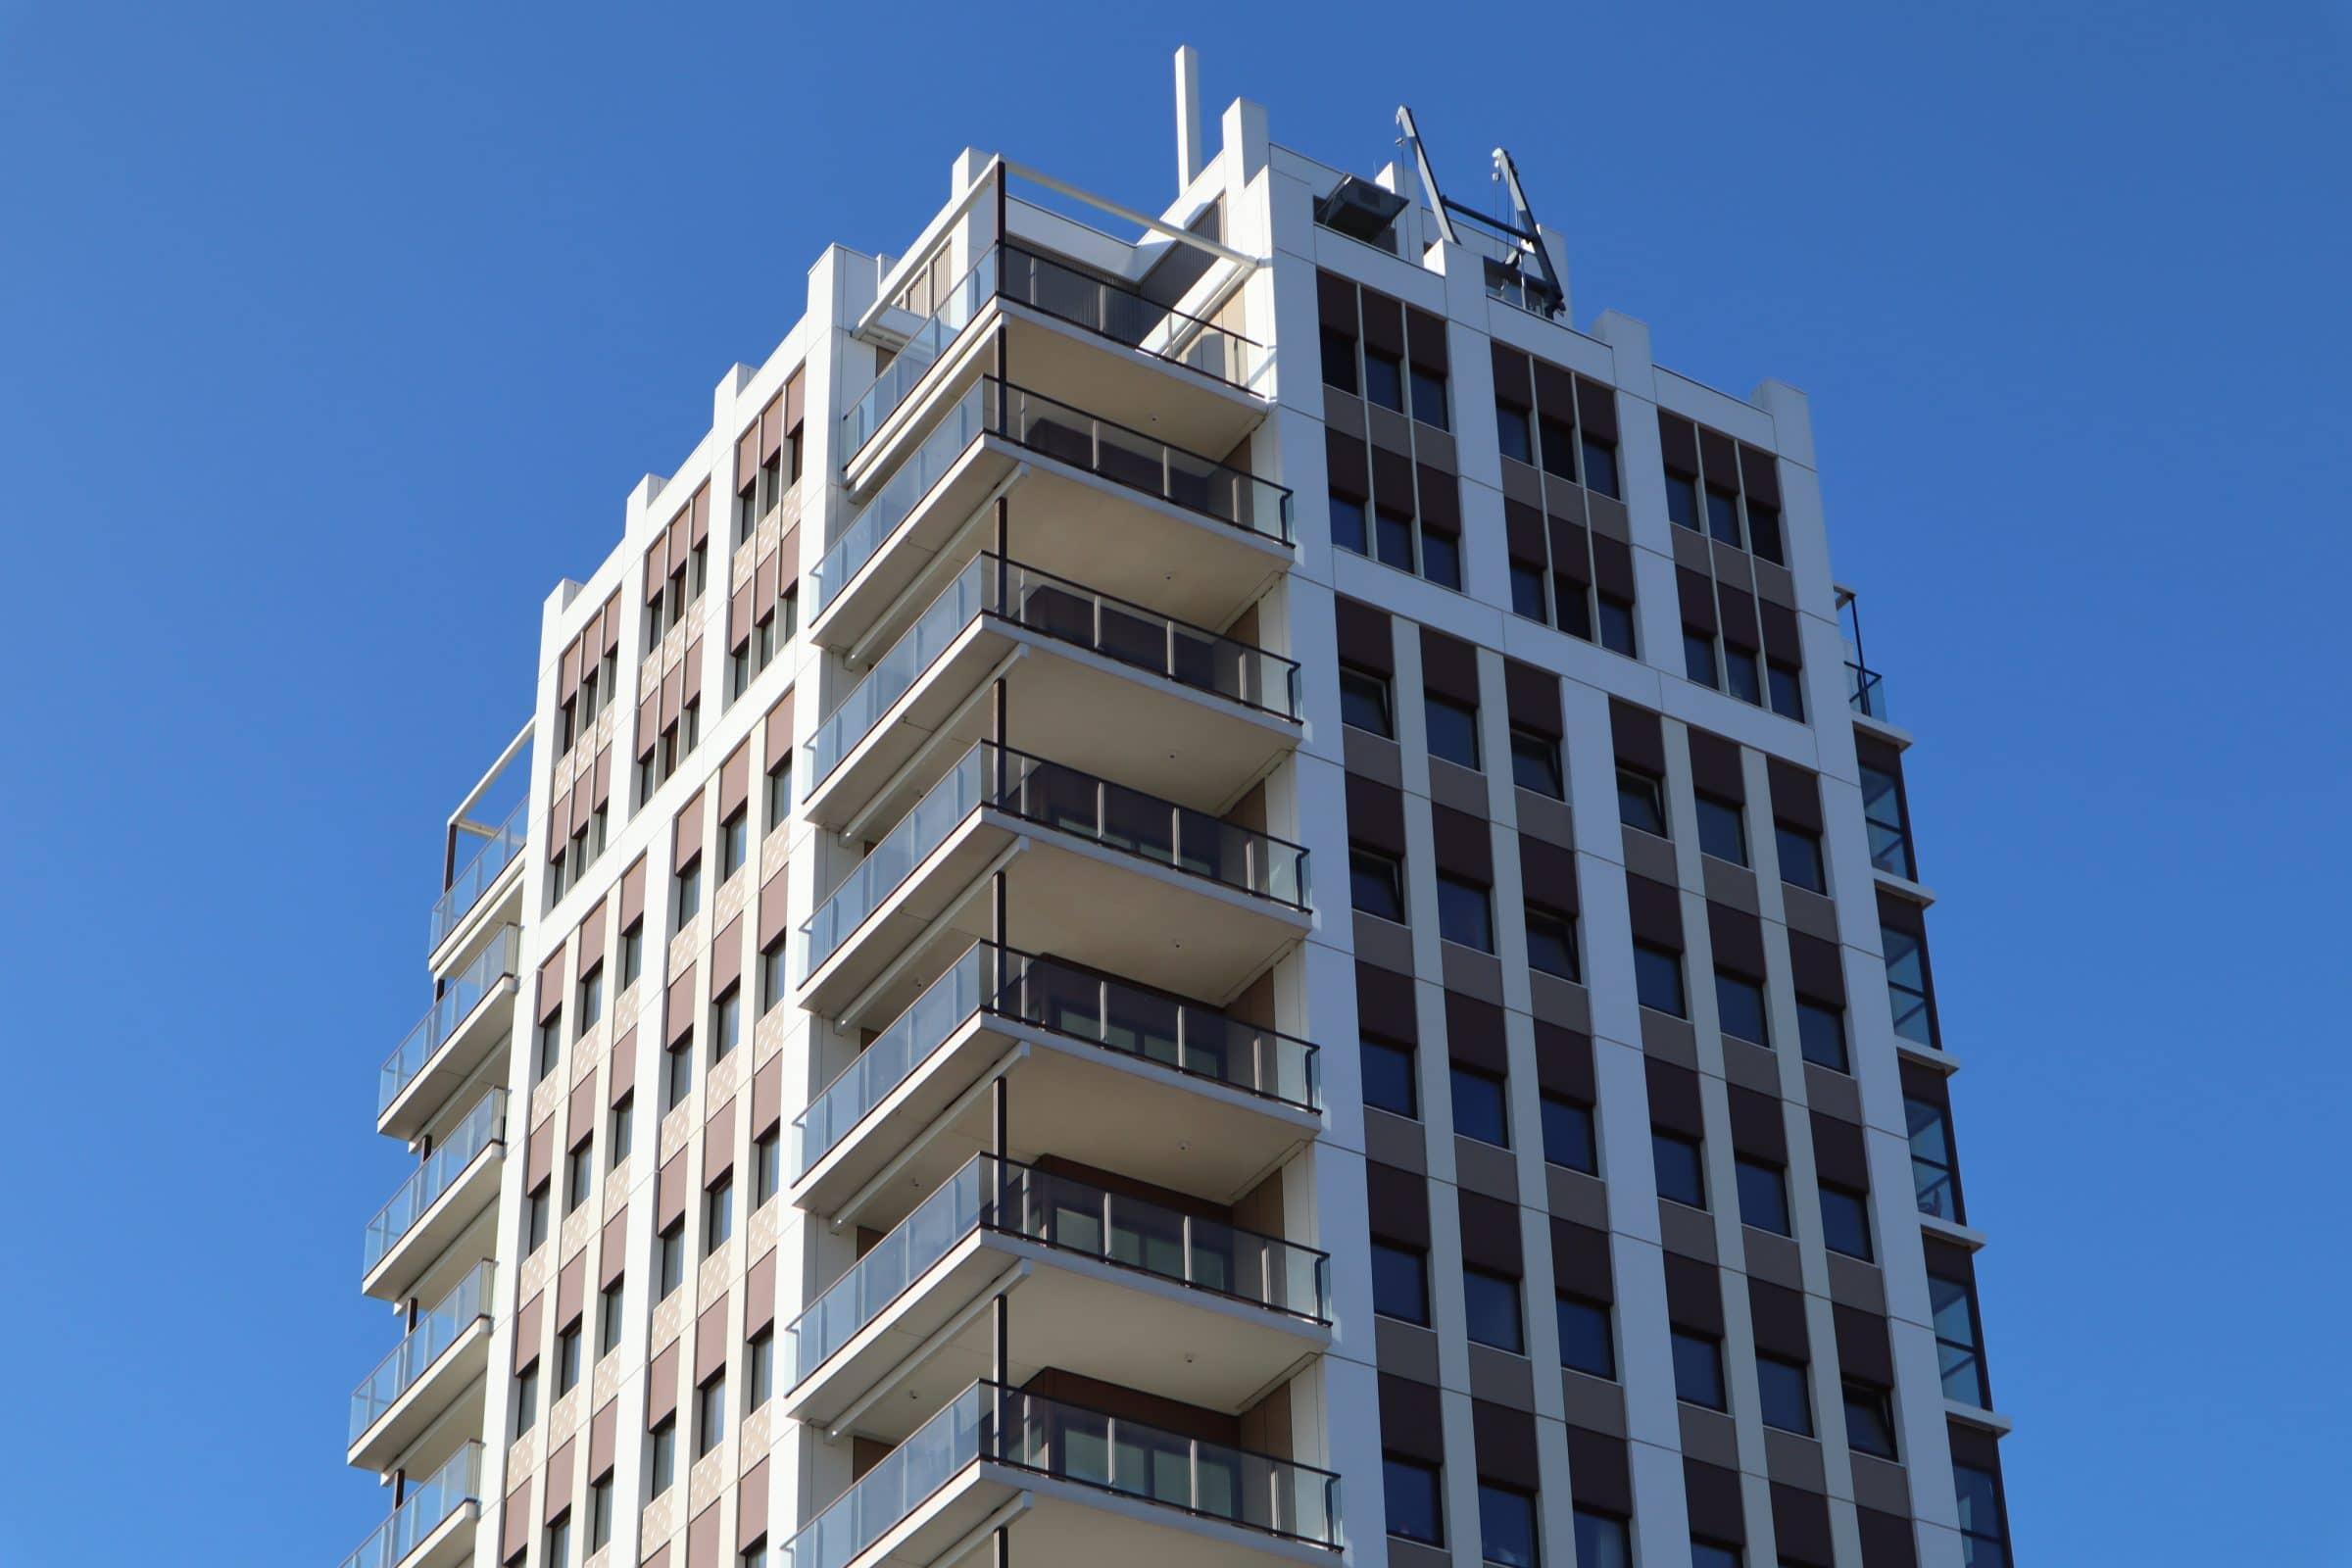 Lightweight slender balconies